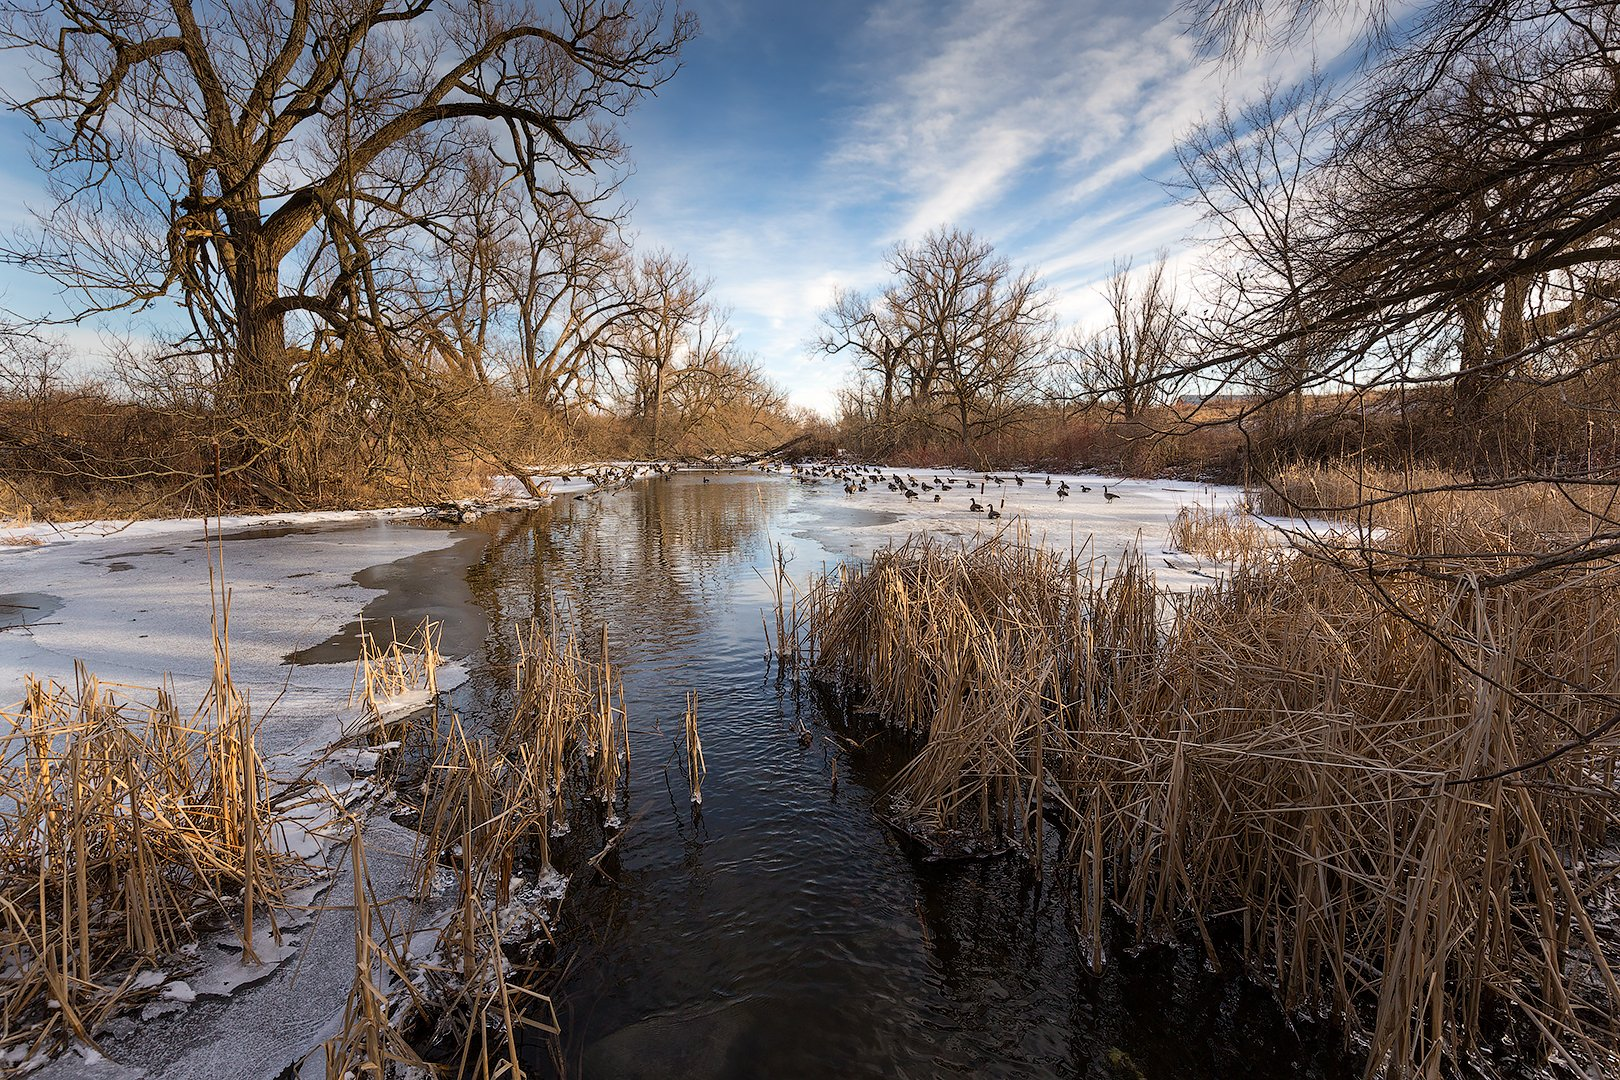 spring, river, ice, trees, sun, geese, весна, река, лёд, деревья, солнце, гуси, G A S